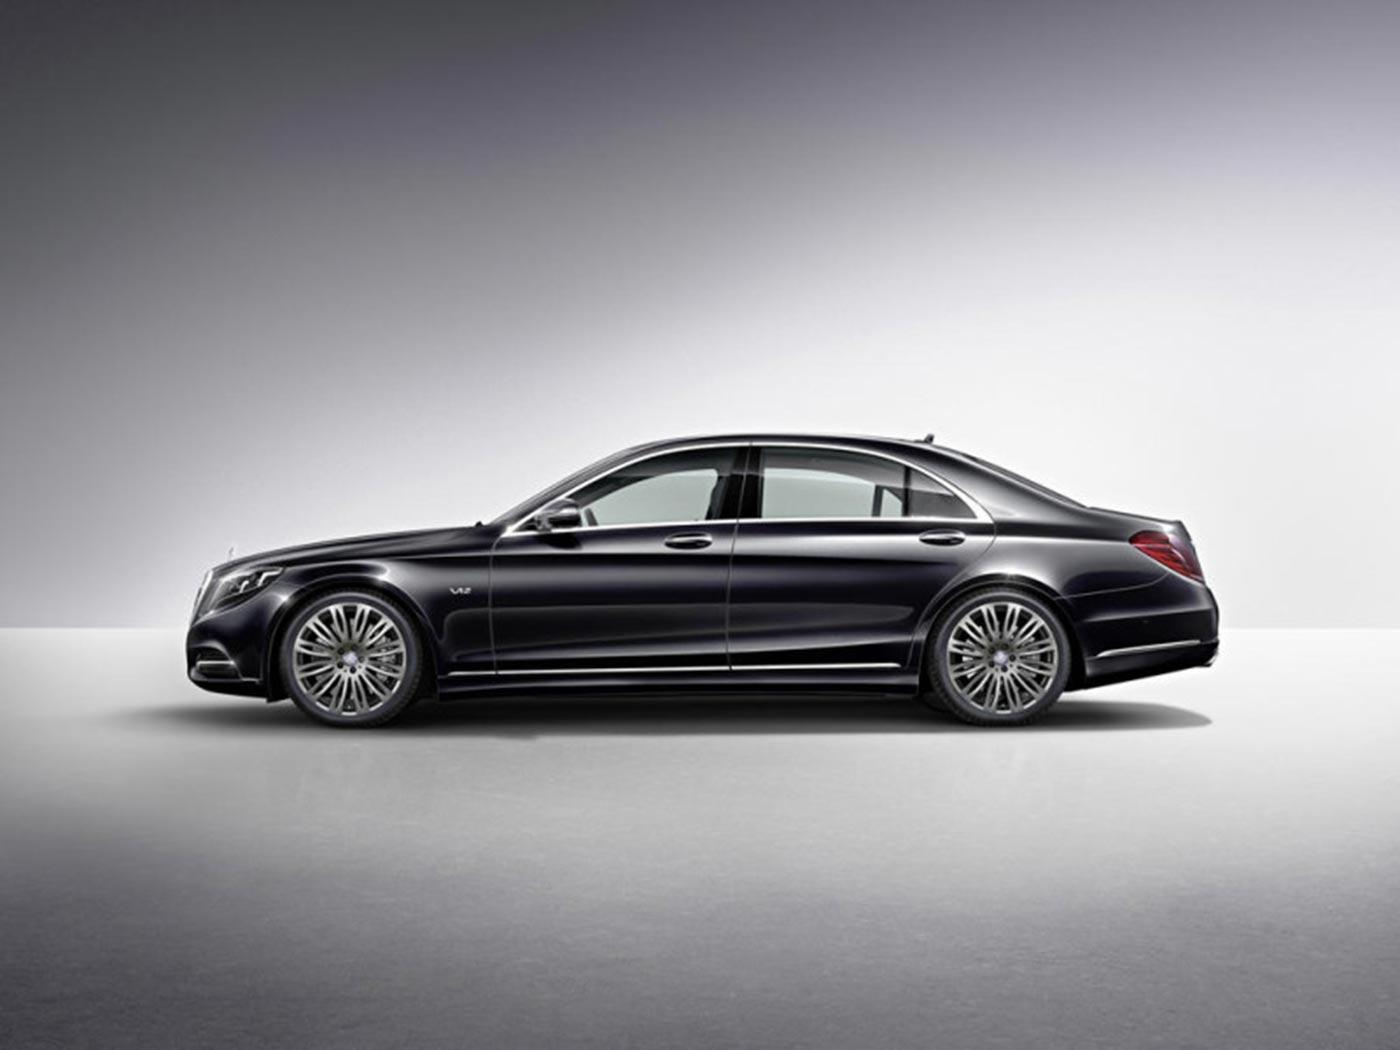 Mercedes Benz Unveils New S600 in Detroit 2